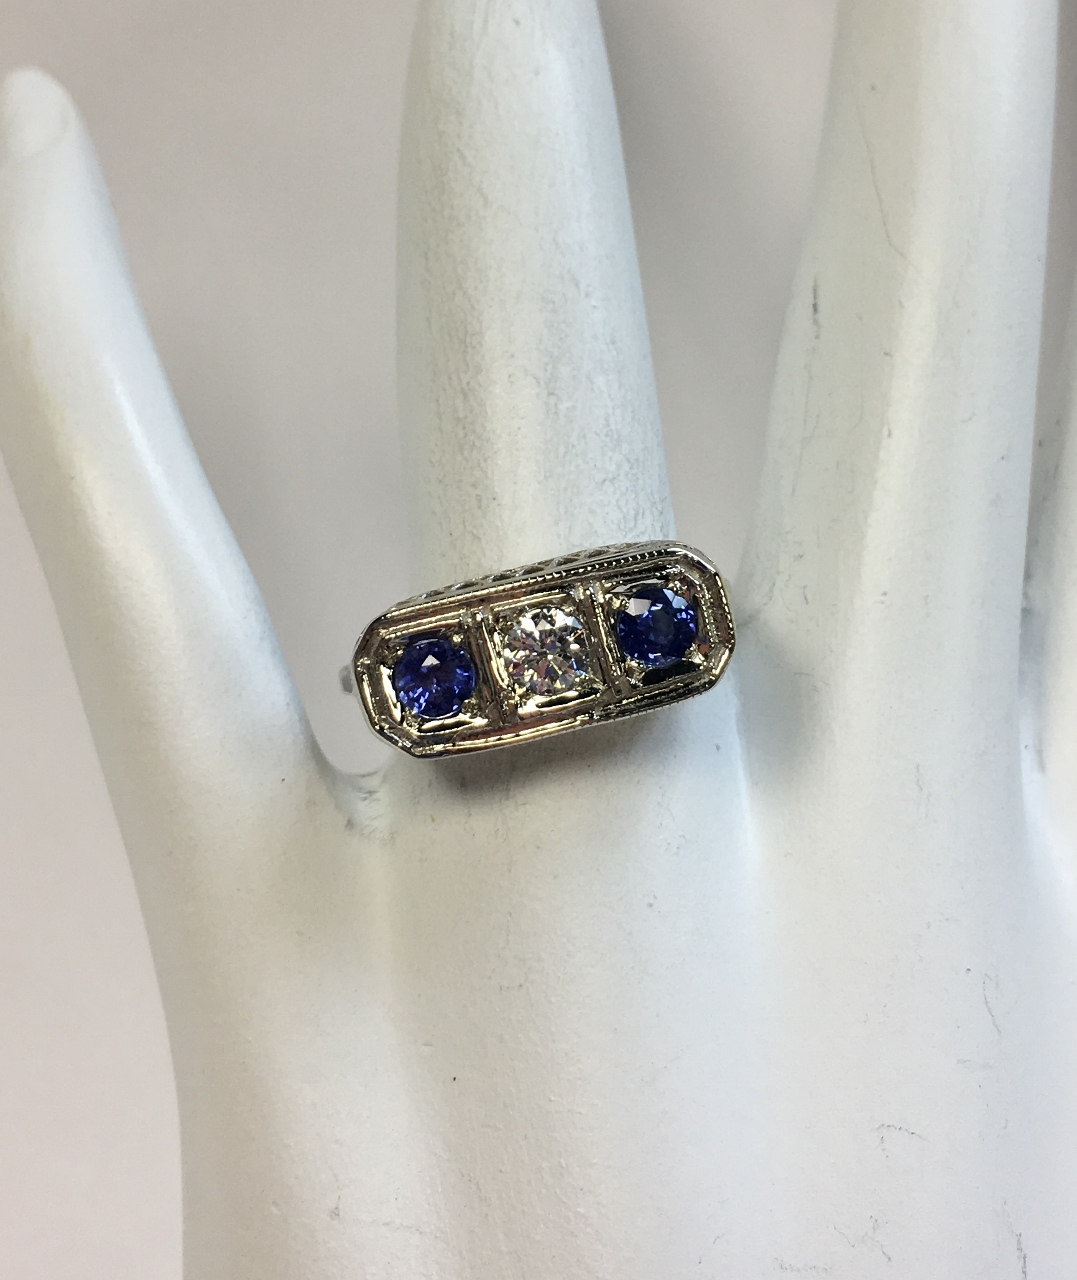 Antique Style Sapphire Diamond Ring